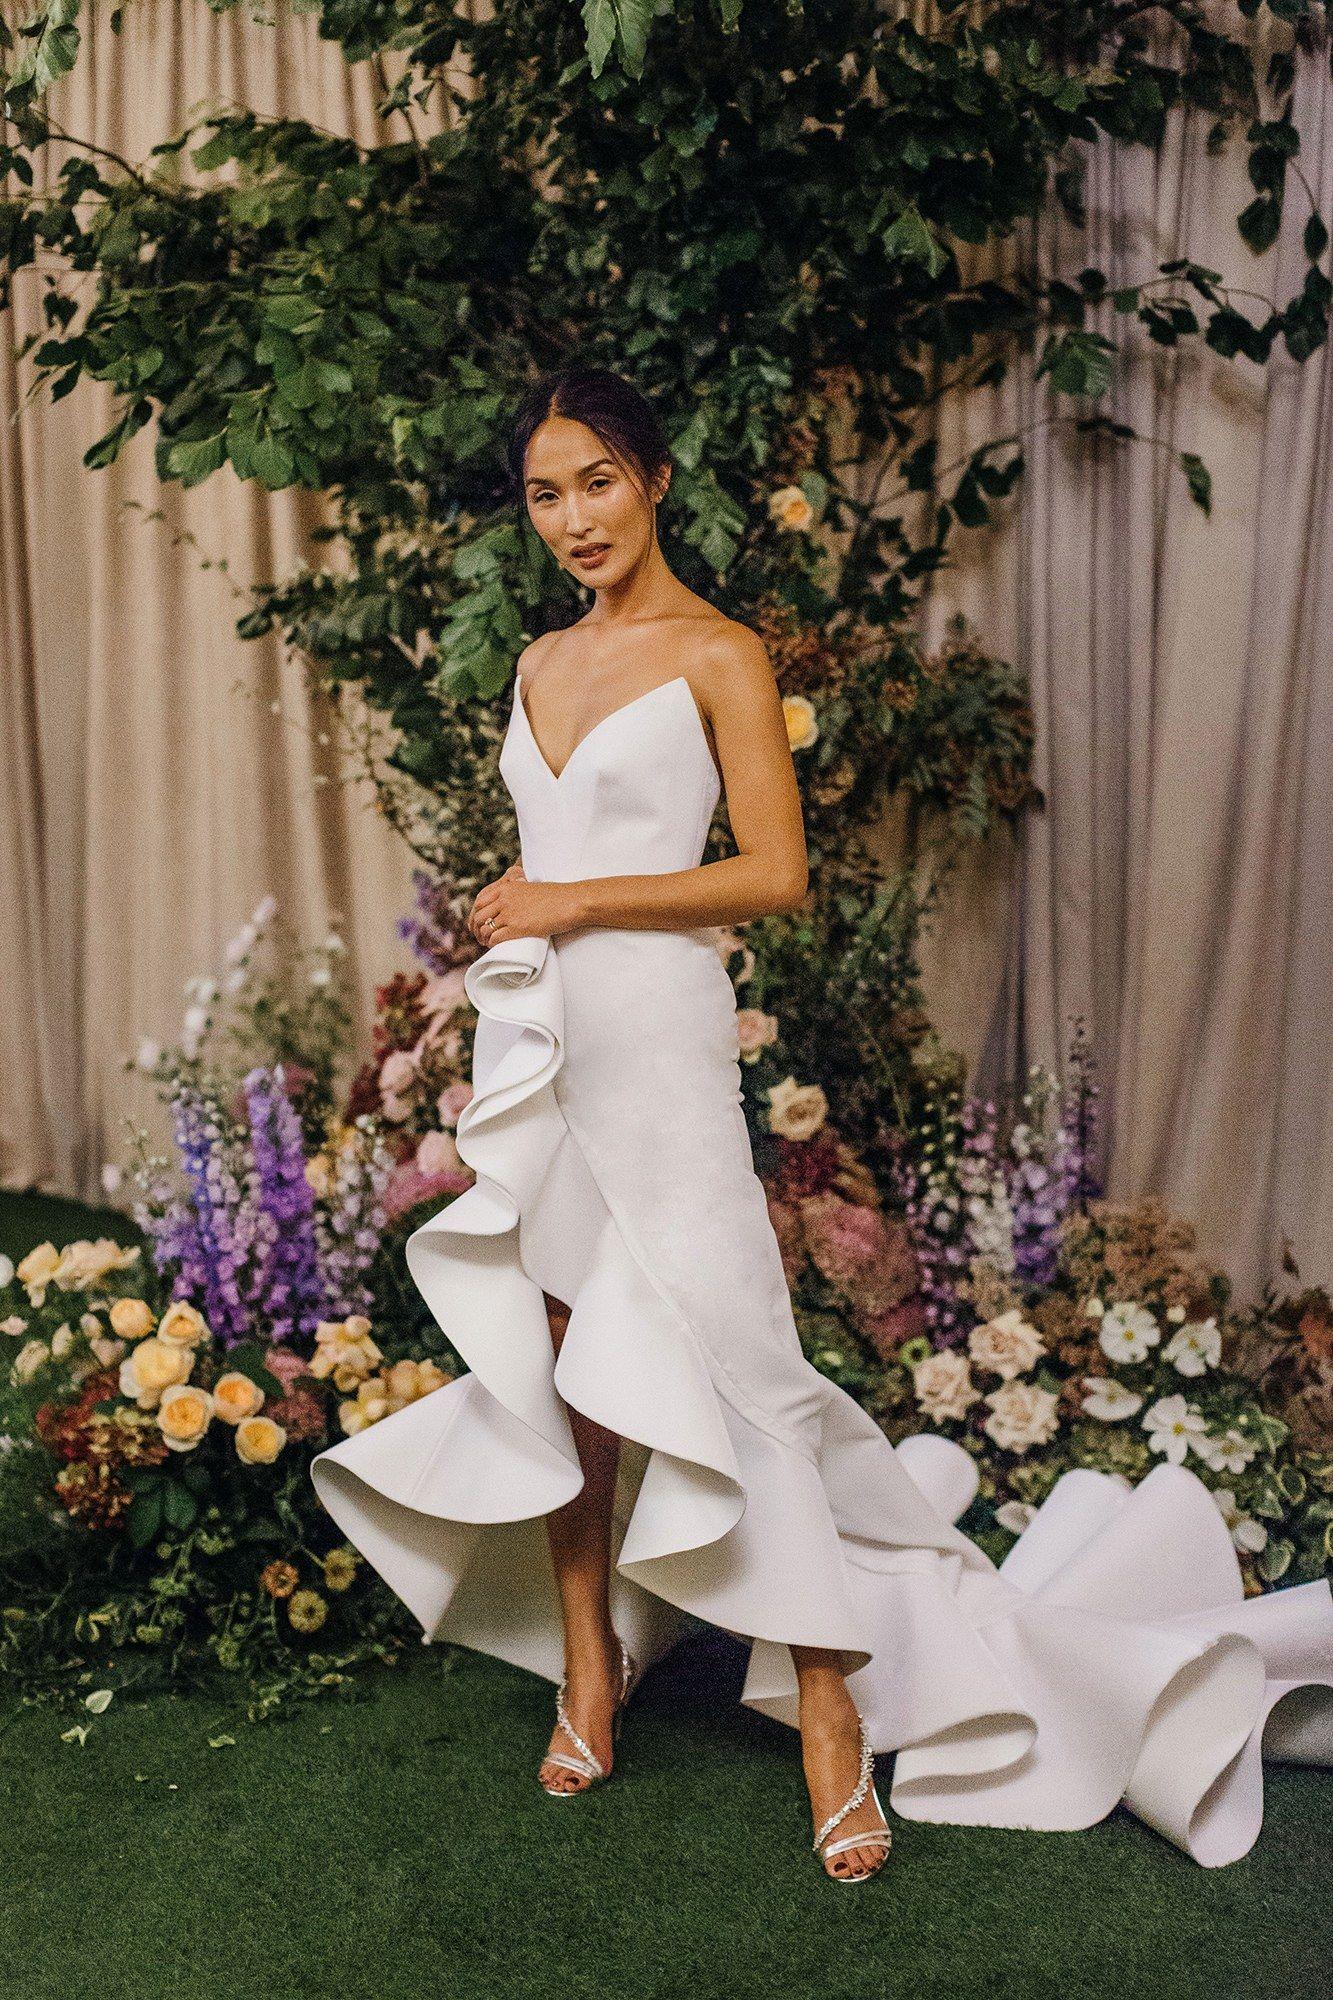 Nicole warne of gary pepper girl had a wild garden wedding in new